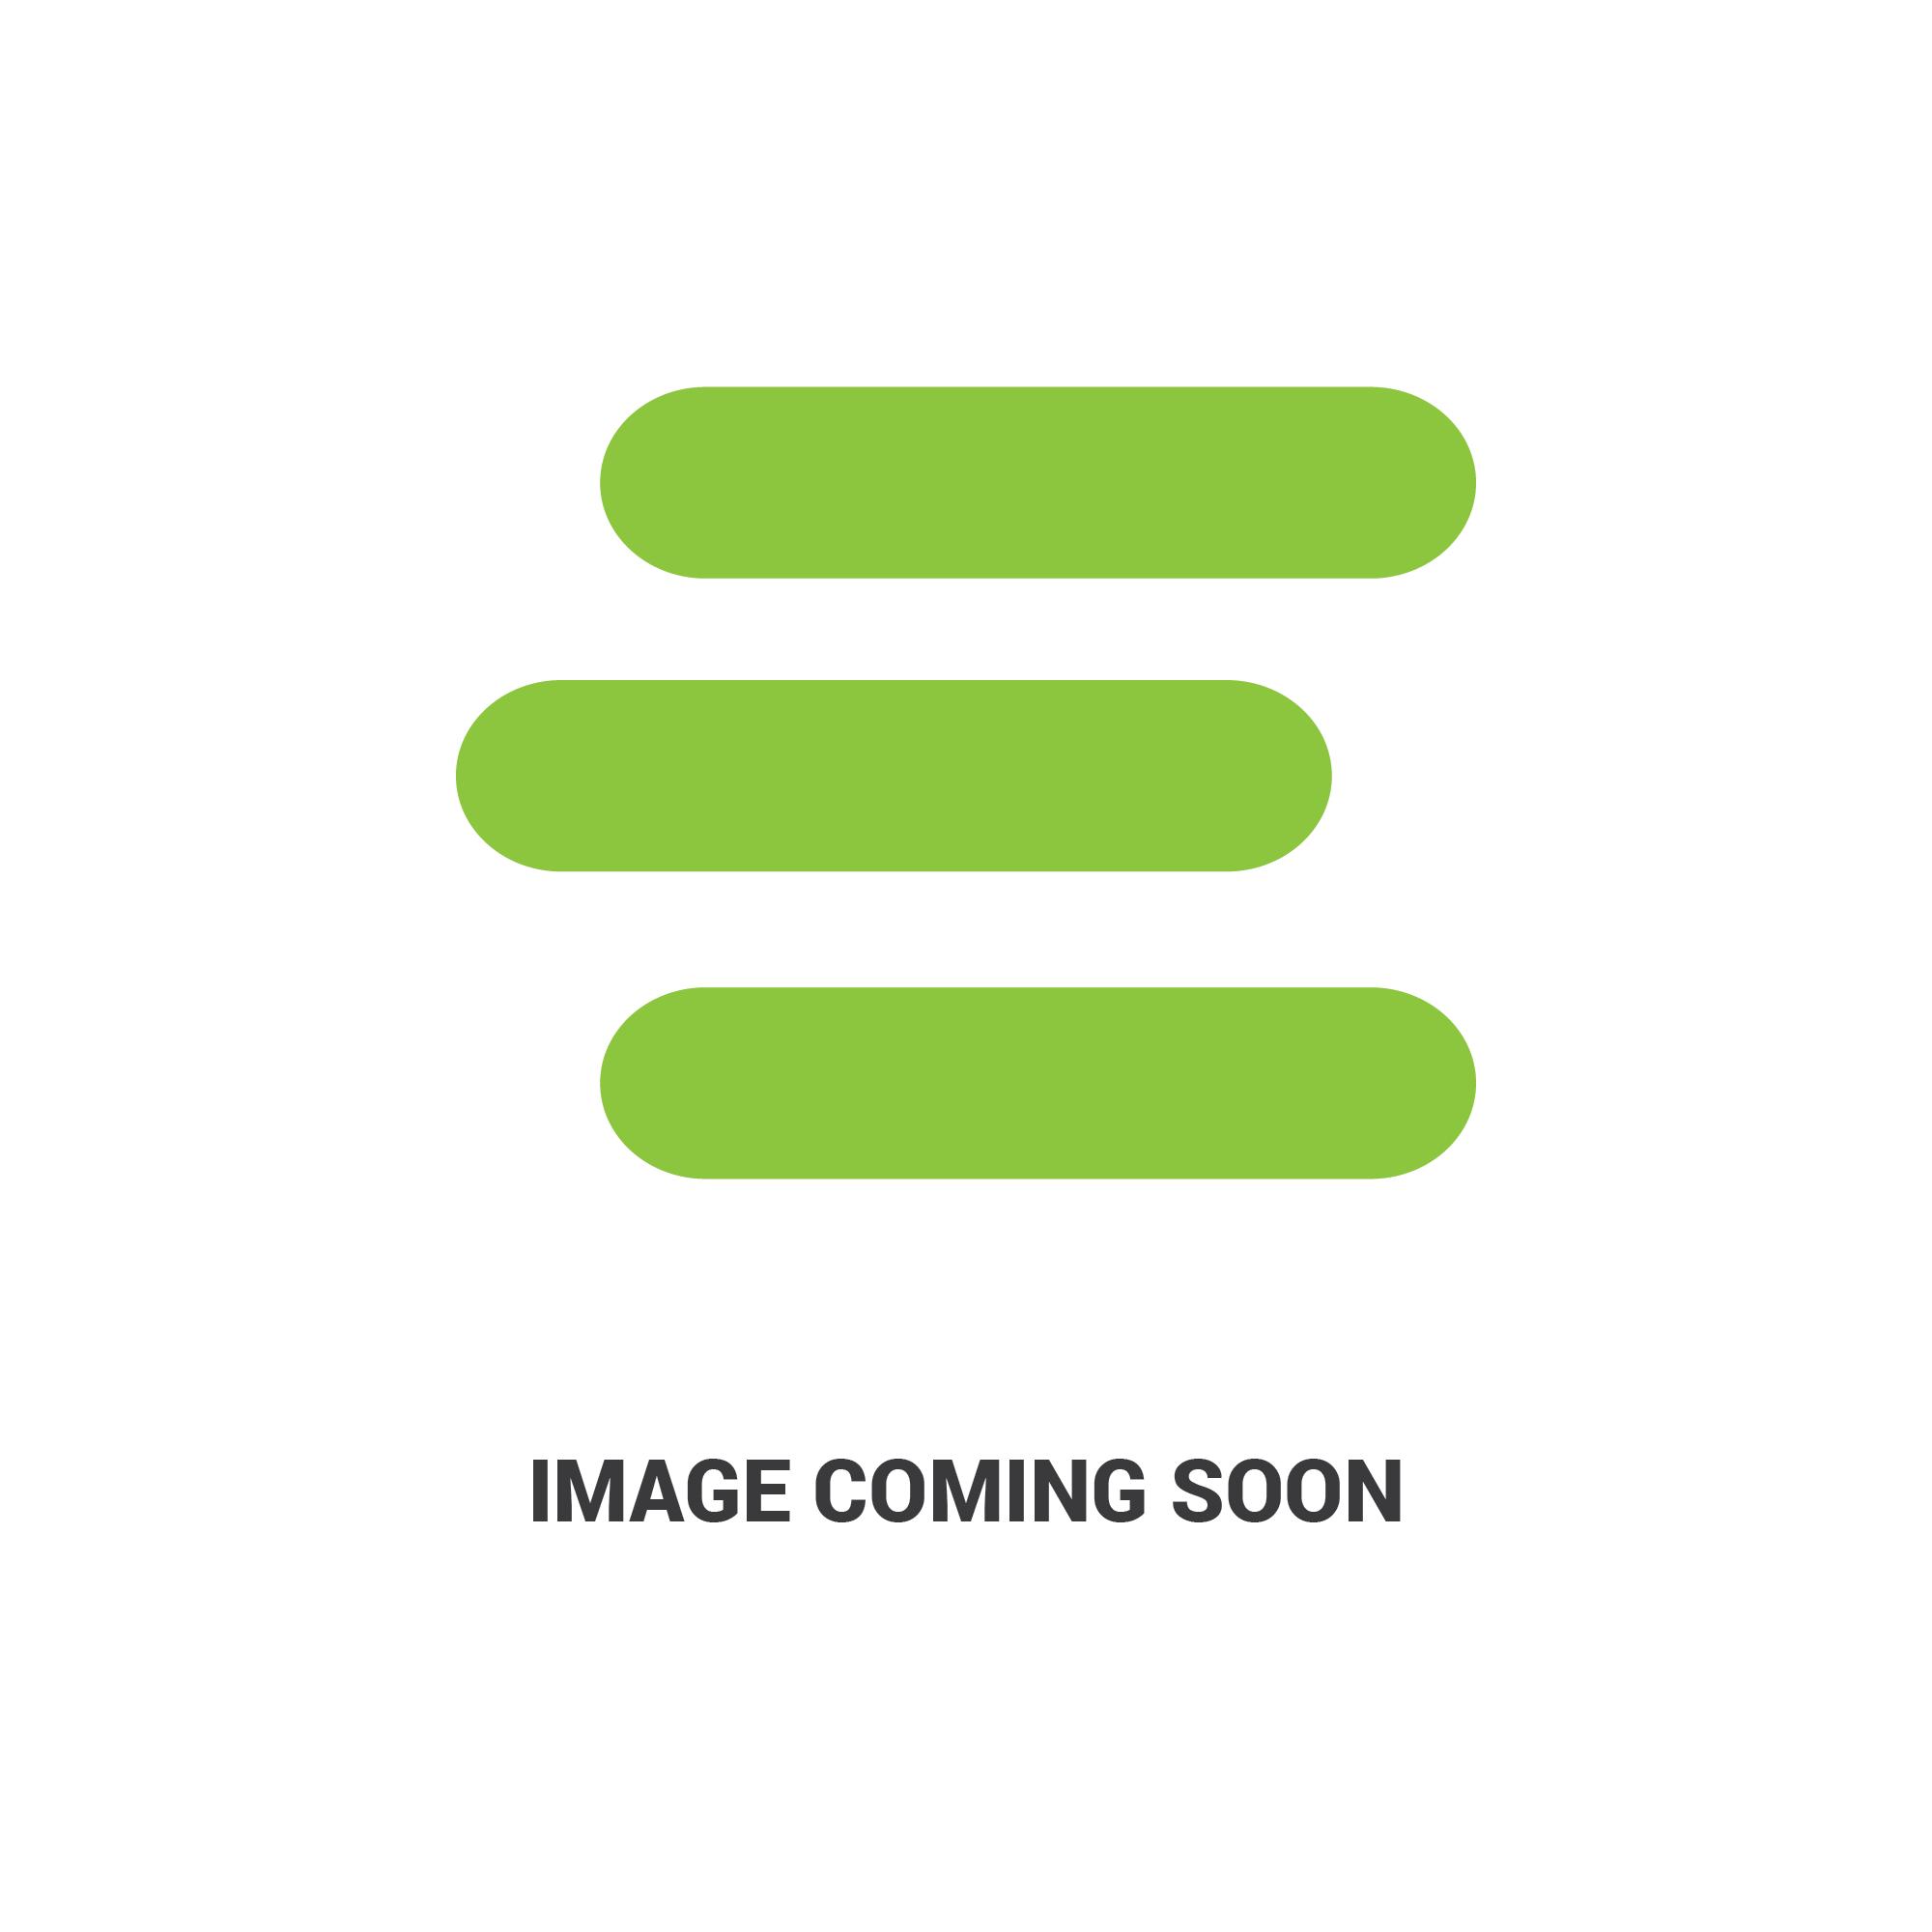 E-3C131-630721344_1.jpg